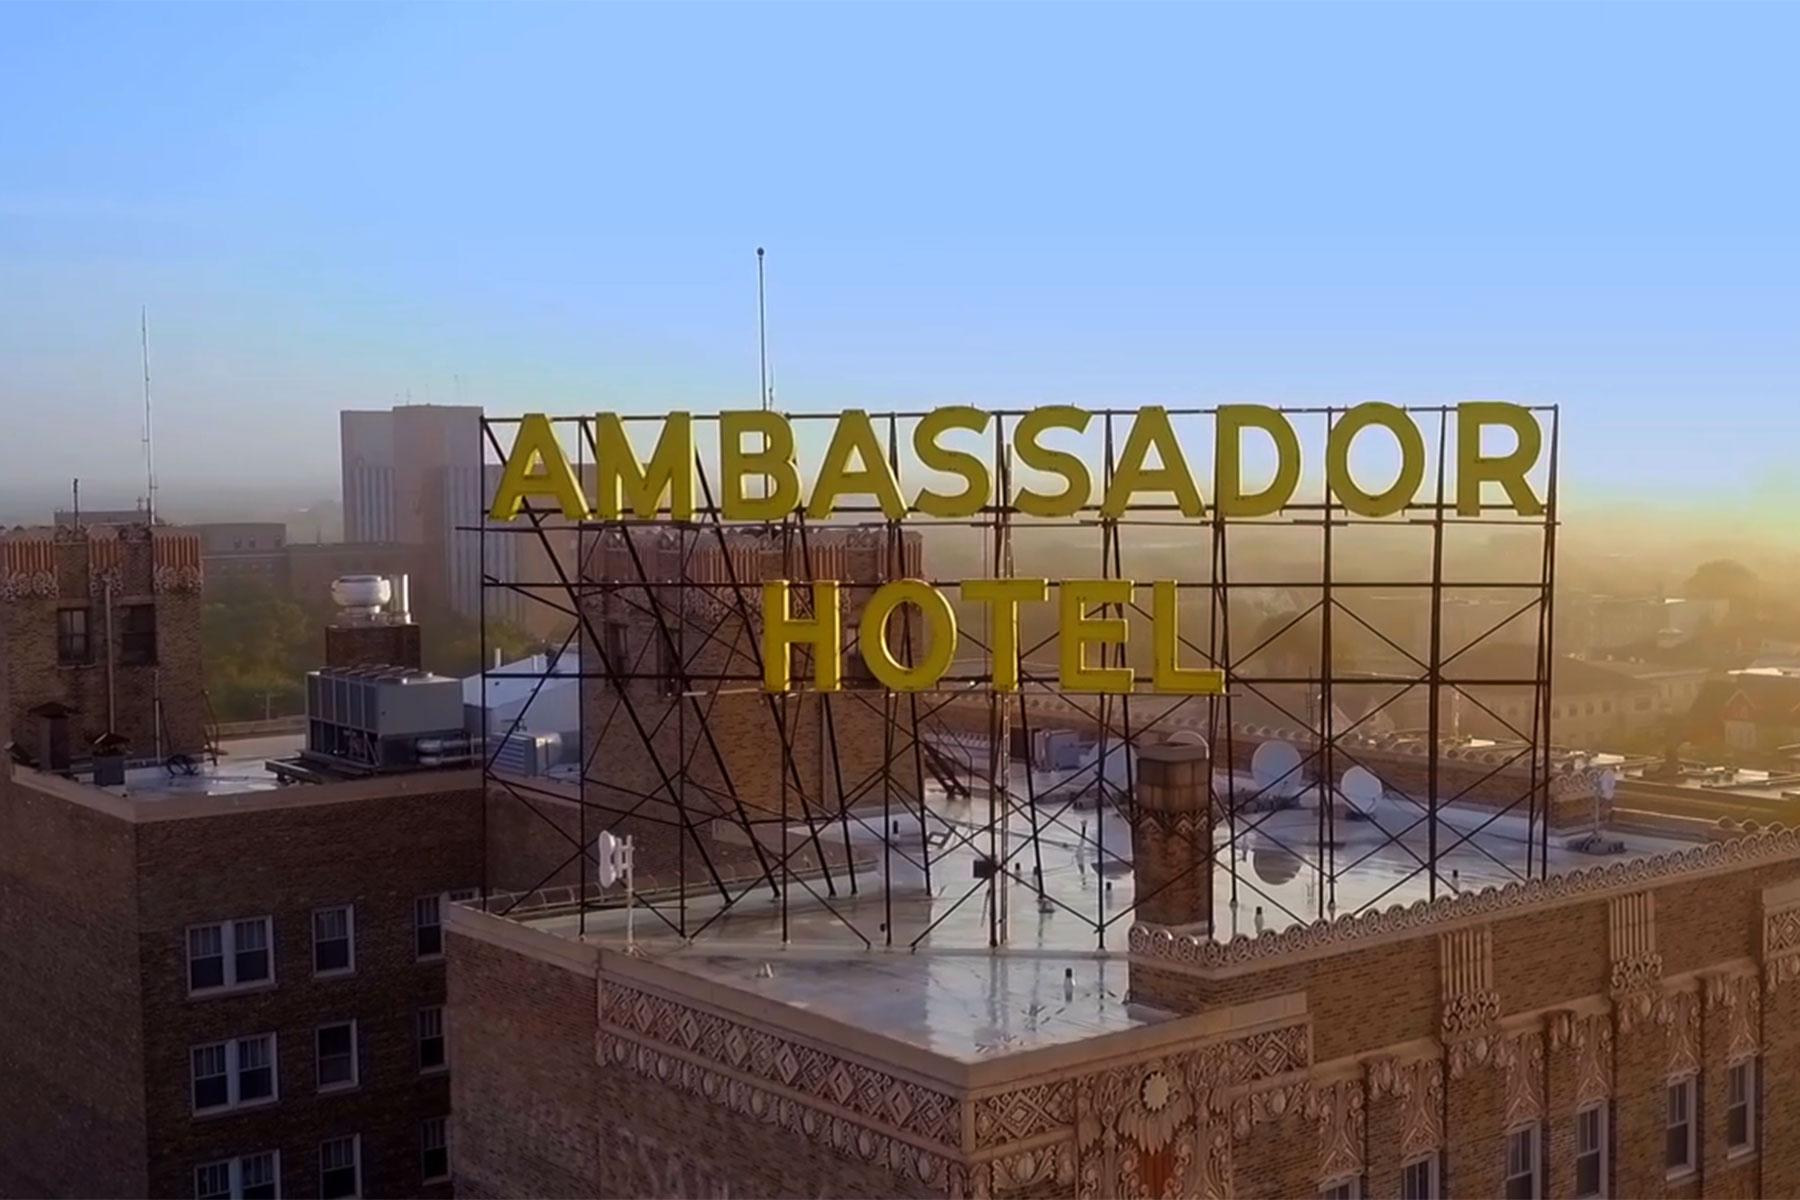 ambassadorhotelview_02